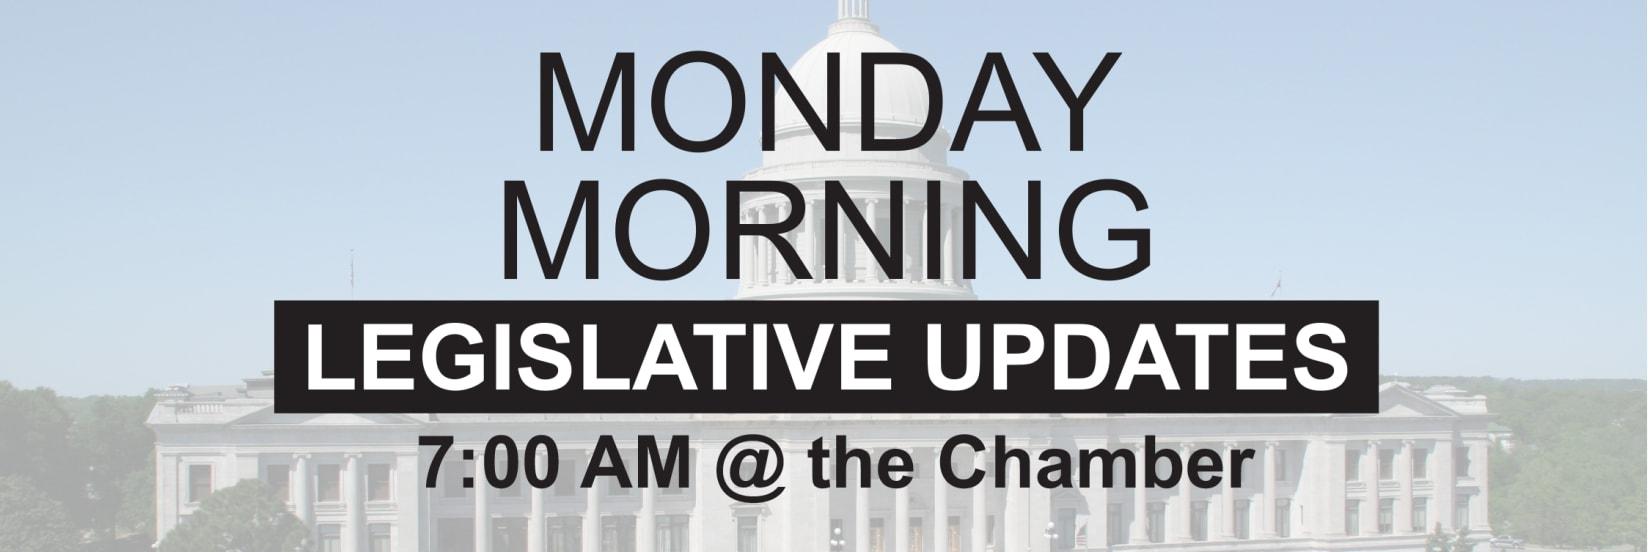 Monday-Morning-legislative-updates.jpg